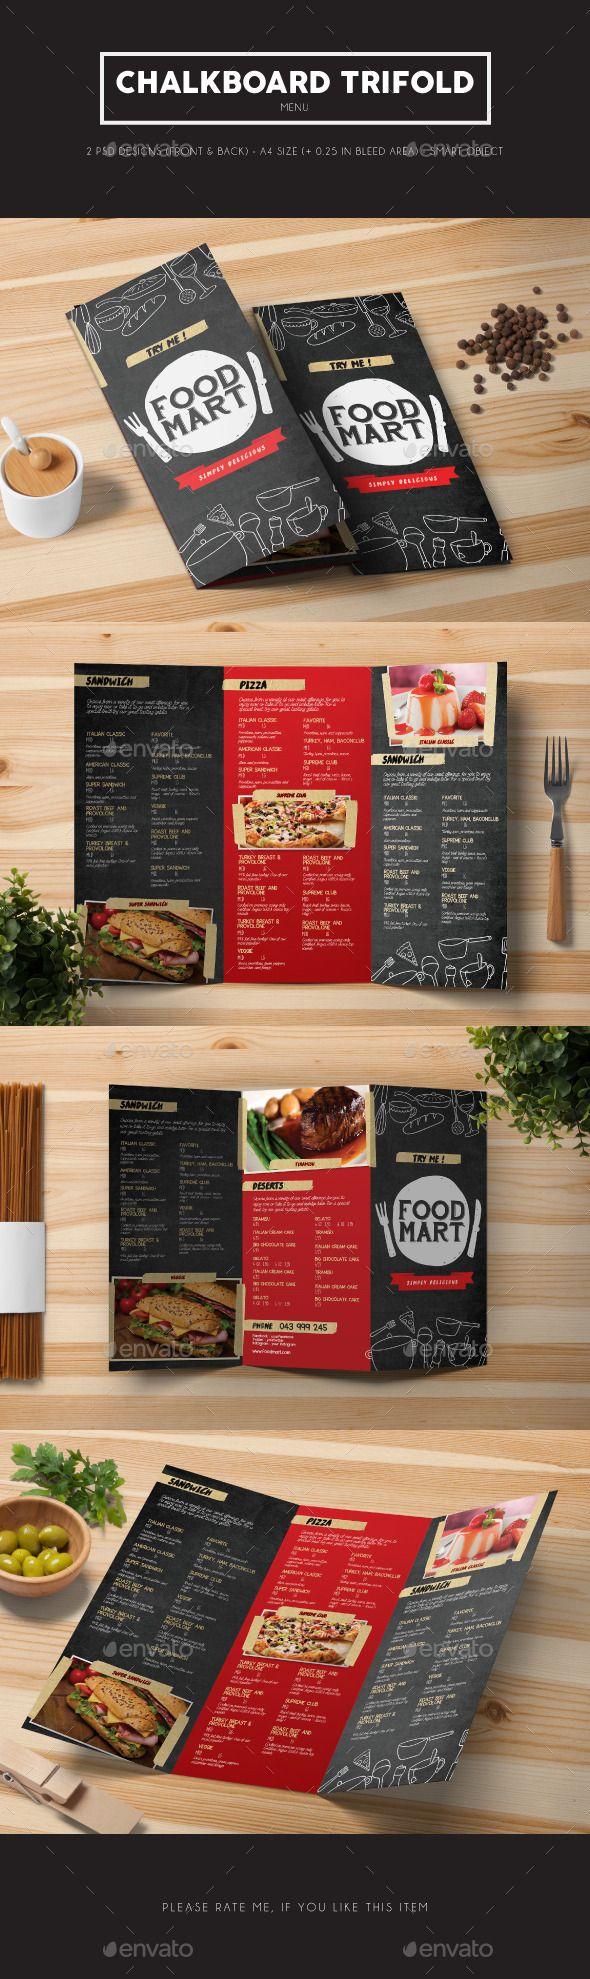 Chalkboard Trifold Menu Template PSD #design Download: http://graphicriver.net/item/chalkboard-trifold-menu/13233115?ref=ksioks